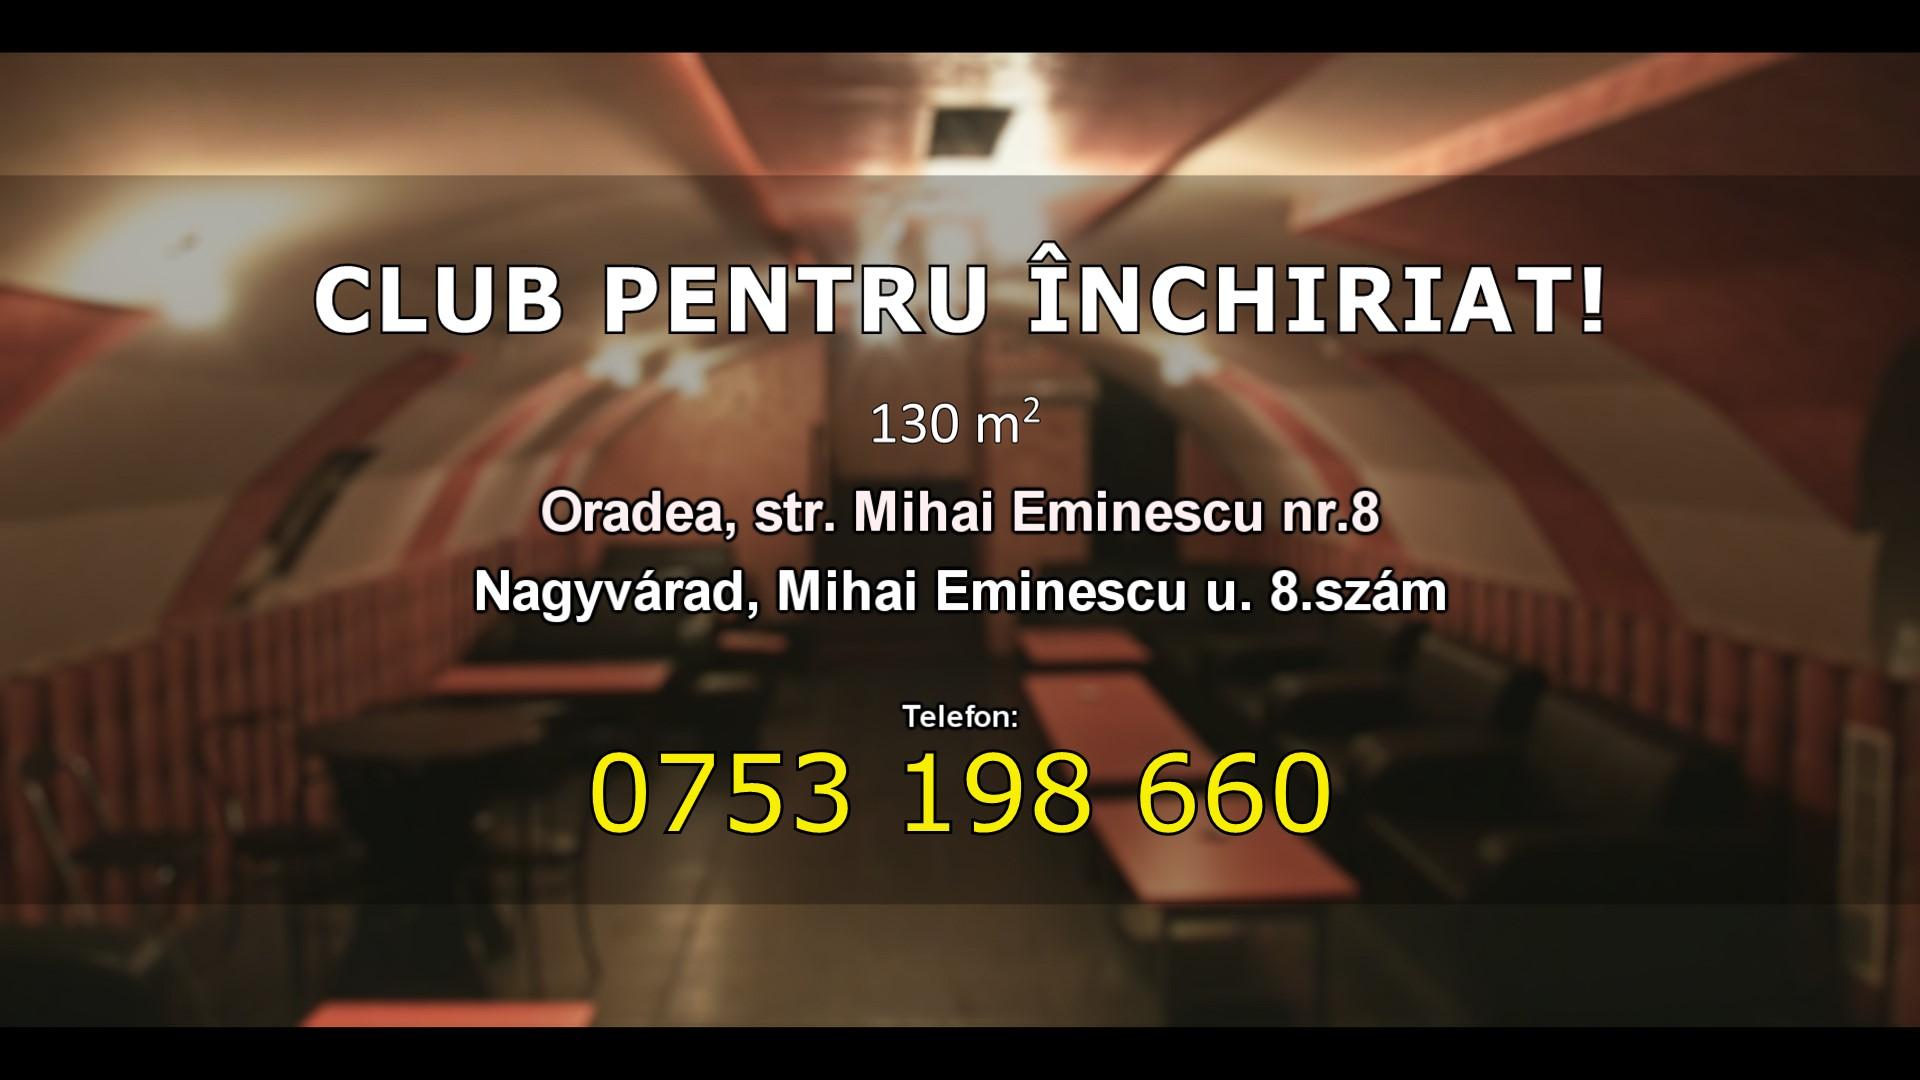 CLUB PENTRU �NCHIRIAT! - KIAD� KLUBHELYS�G!